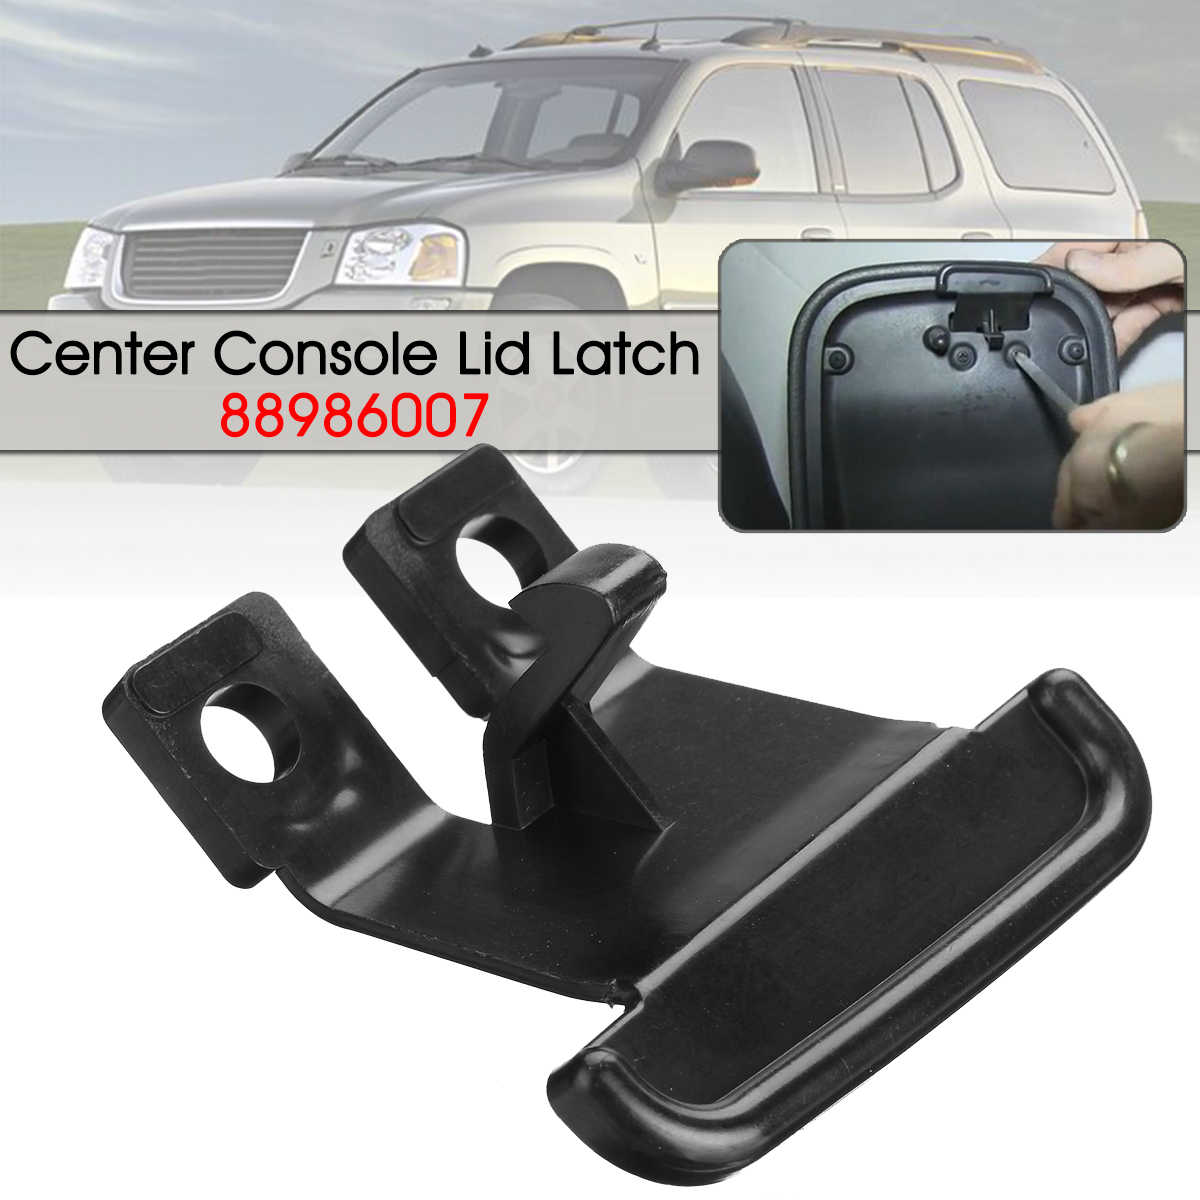 Car Armrest Cover Latch Clip Center Console Lid Lock For Chevrolet Trailblazer For Buick Rainer 88986007 Armrests Aliexpress